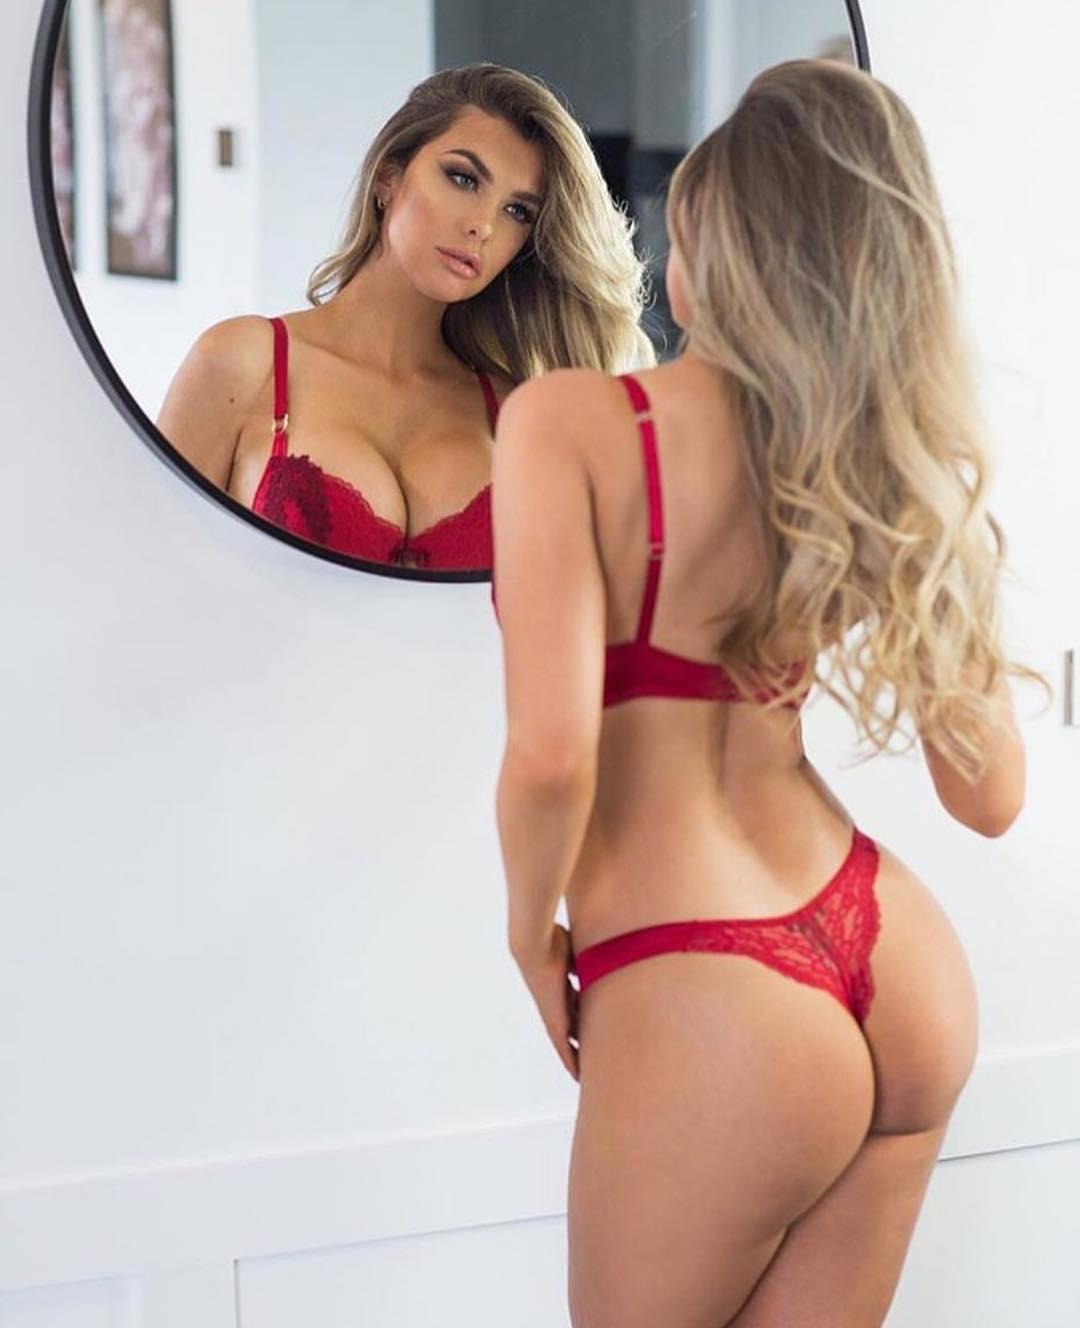 Pics Emily Sears naked (59 photos), Sexy, Fappening, Feet, in bikini 2019